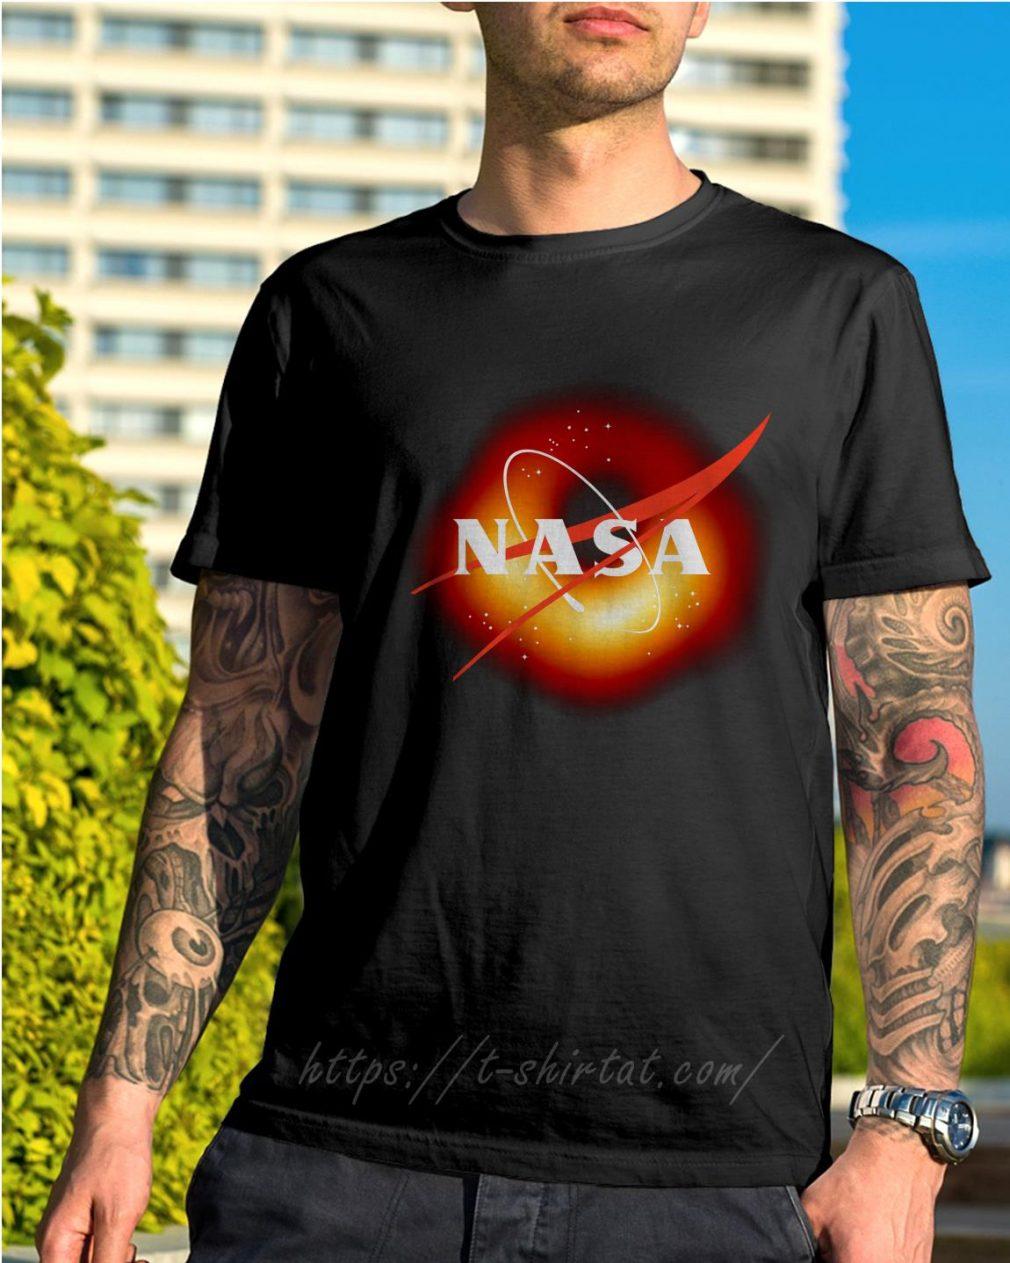 NASA first image of a black hole 2019 shirt